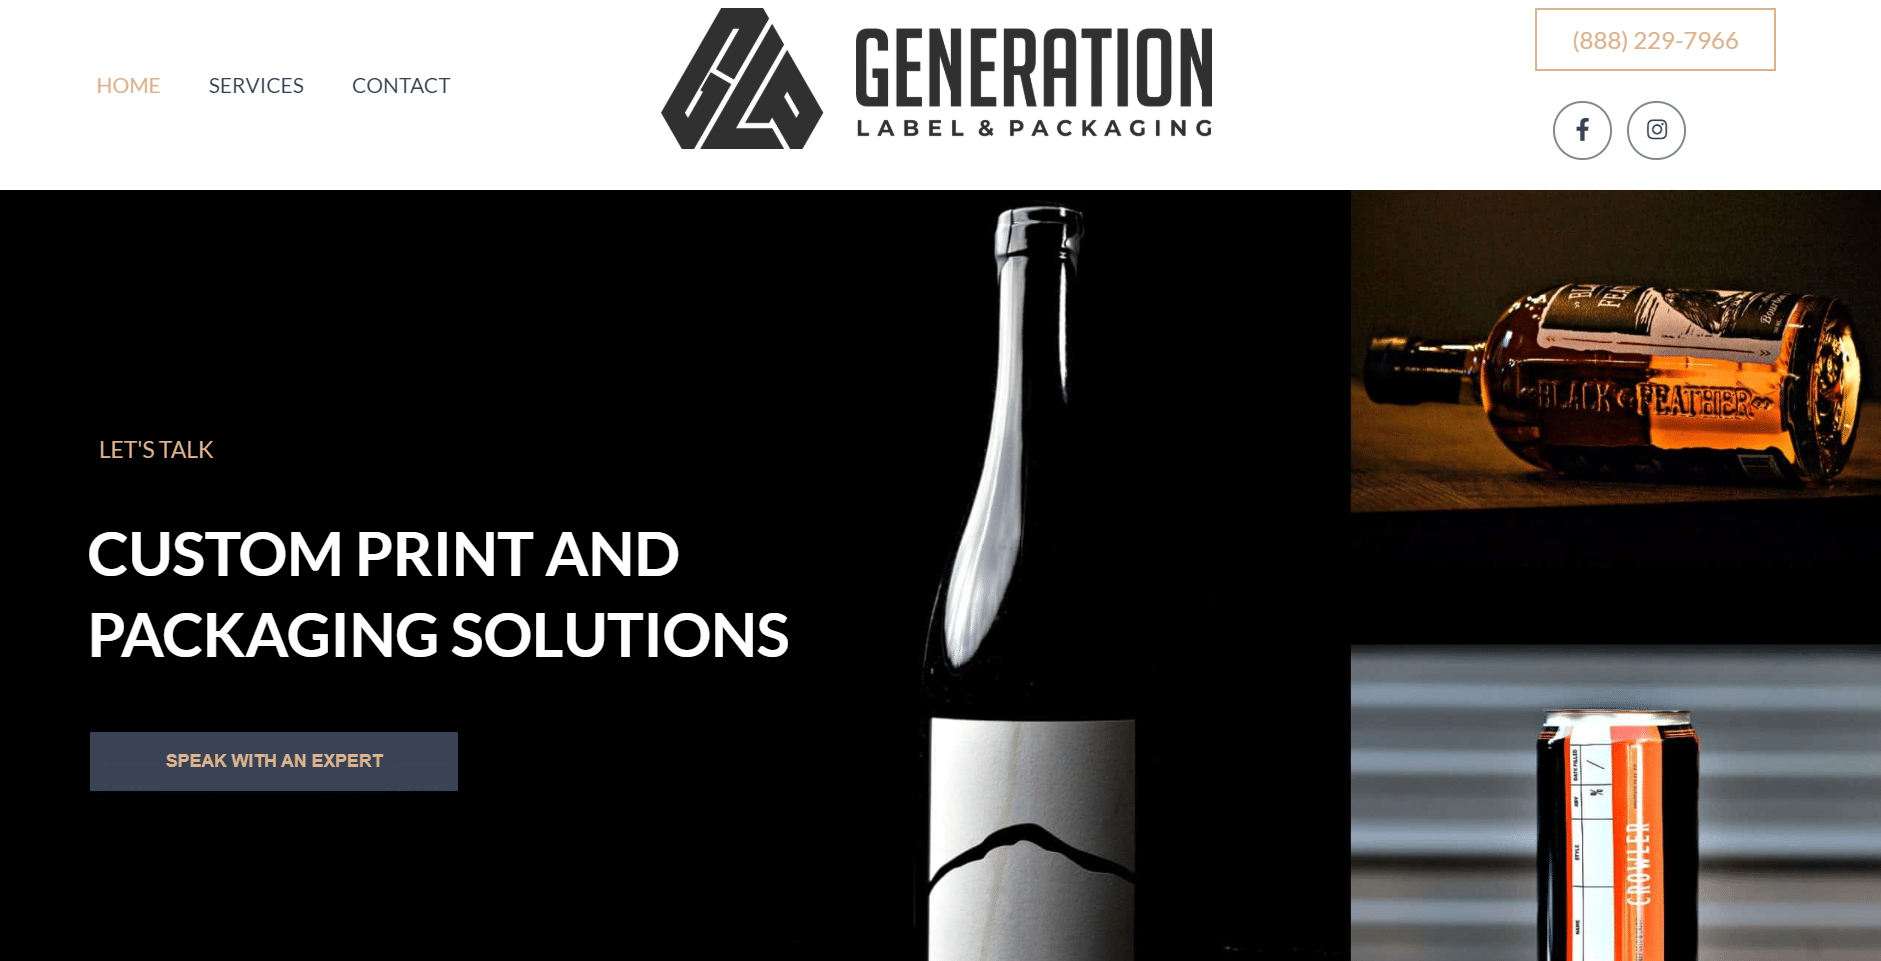 generation label